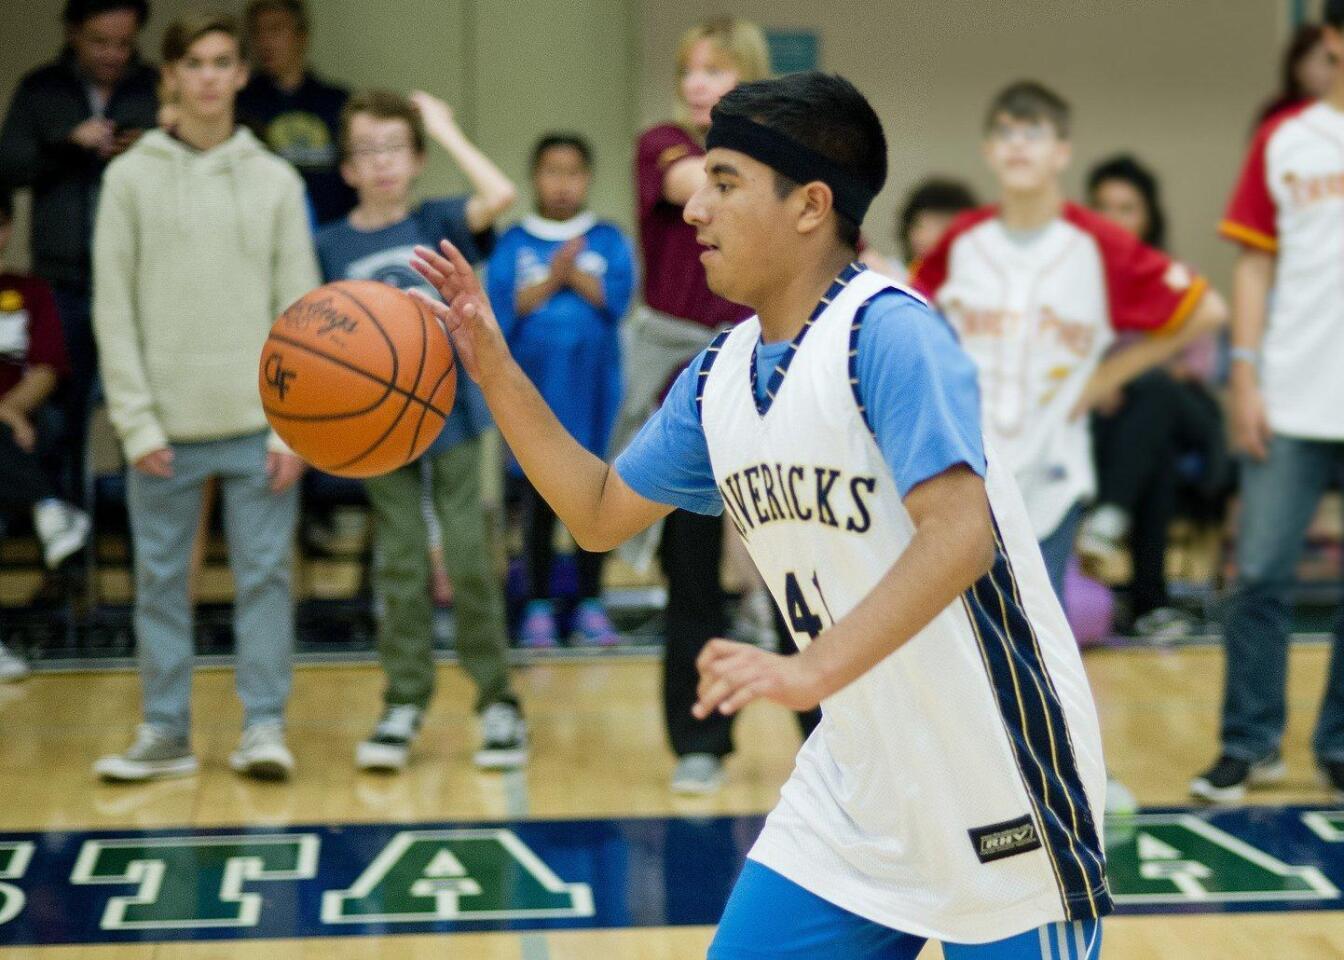 High School District Adapted PE Basketball Tournament